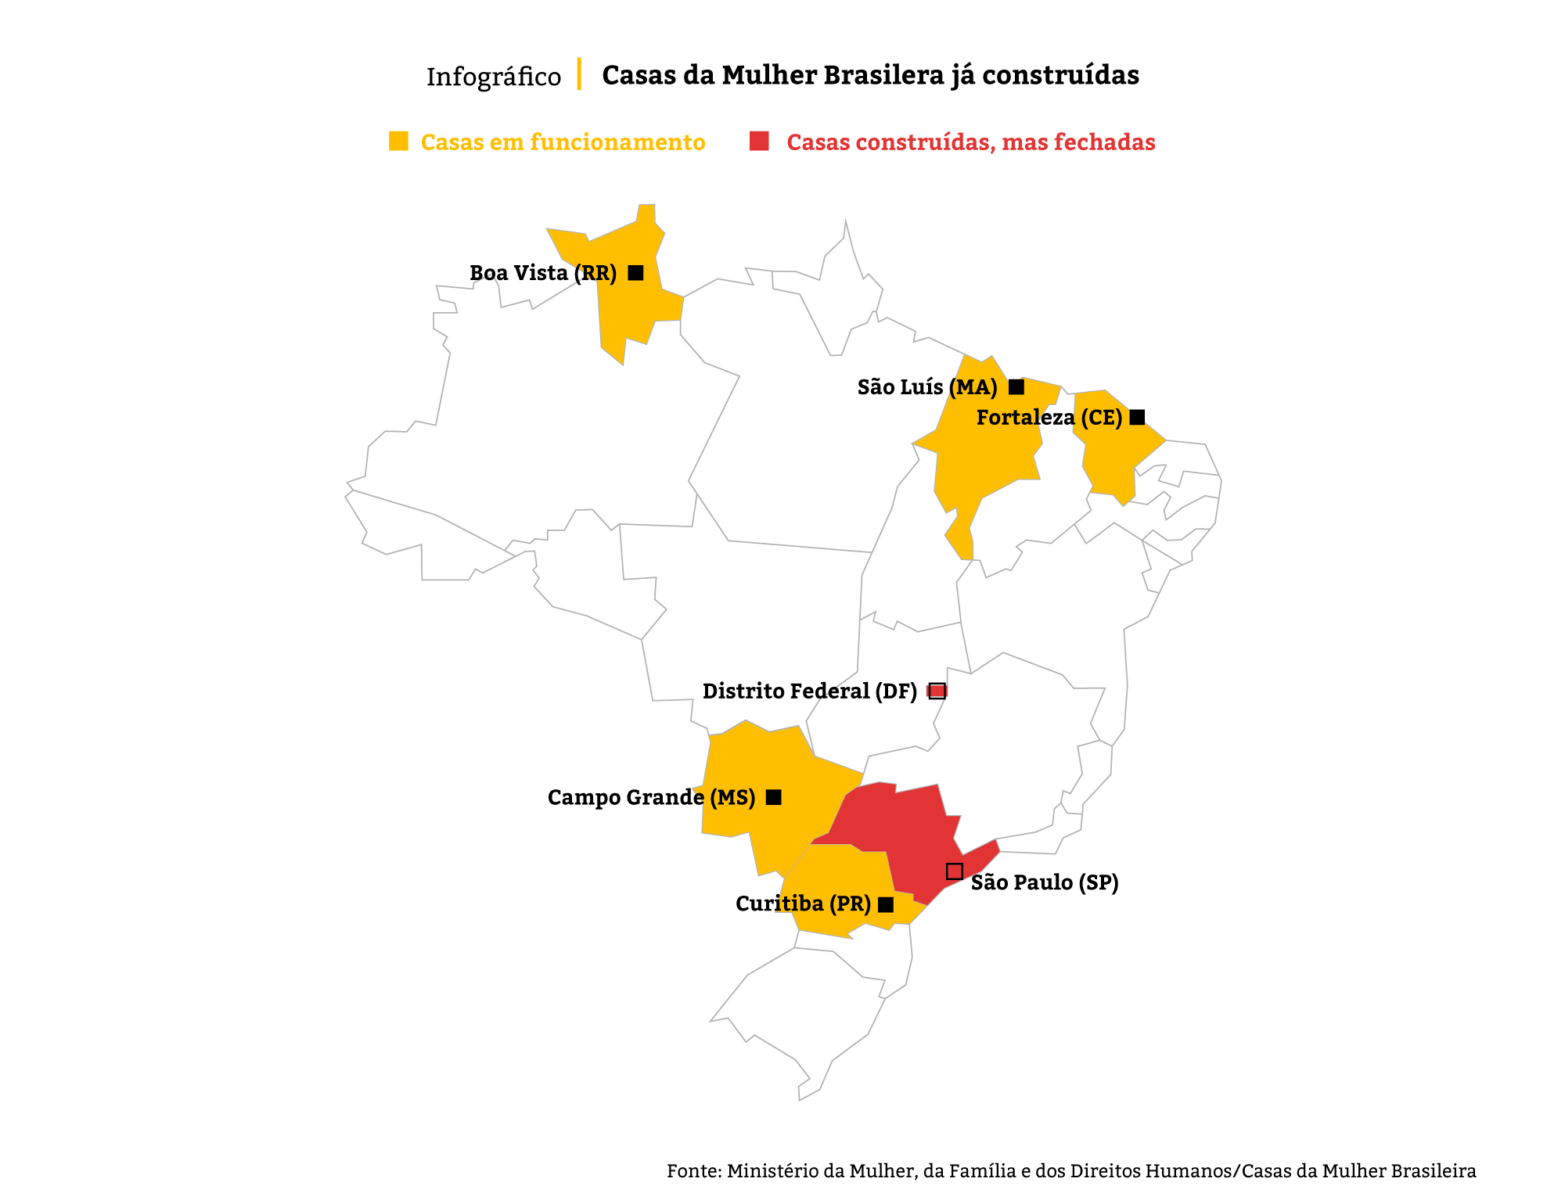 Casas da mulher brasileira já construídas